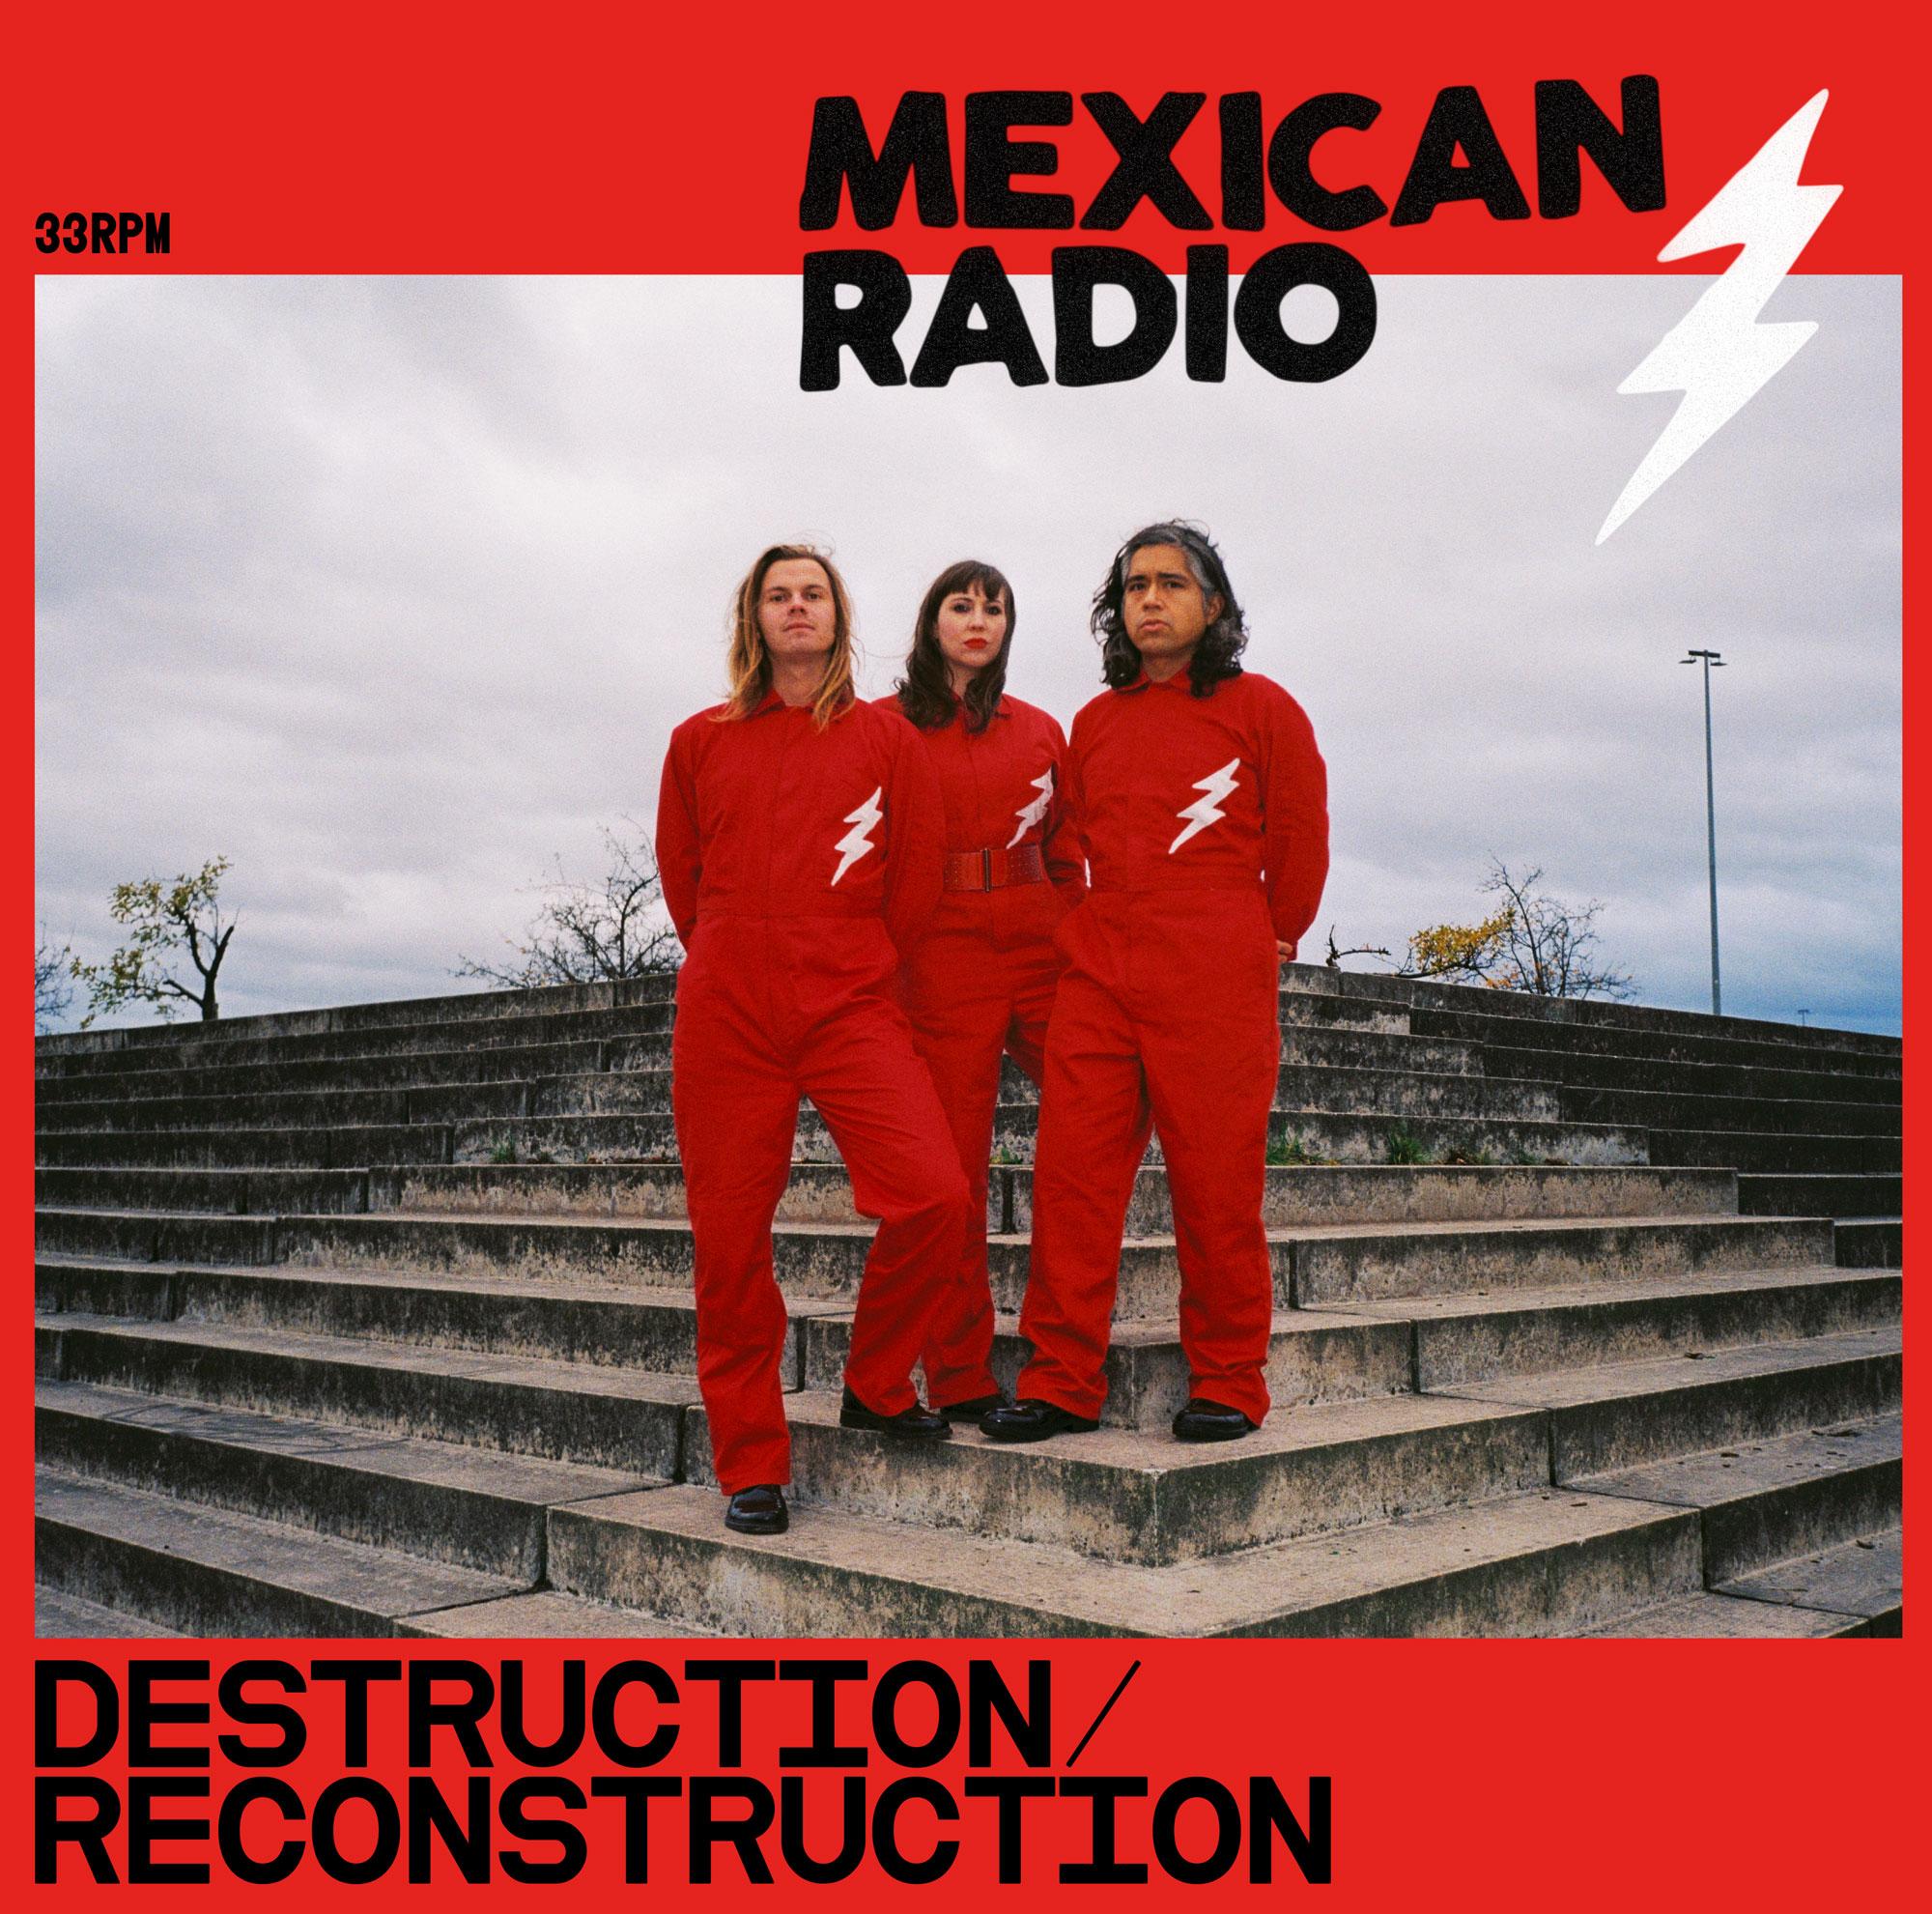 Mexican Radio Artwork.jpg